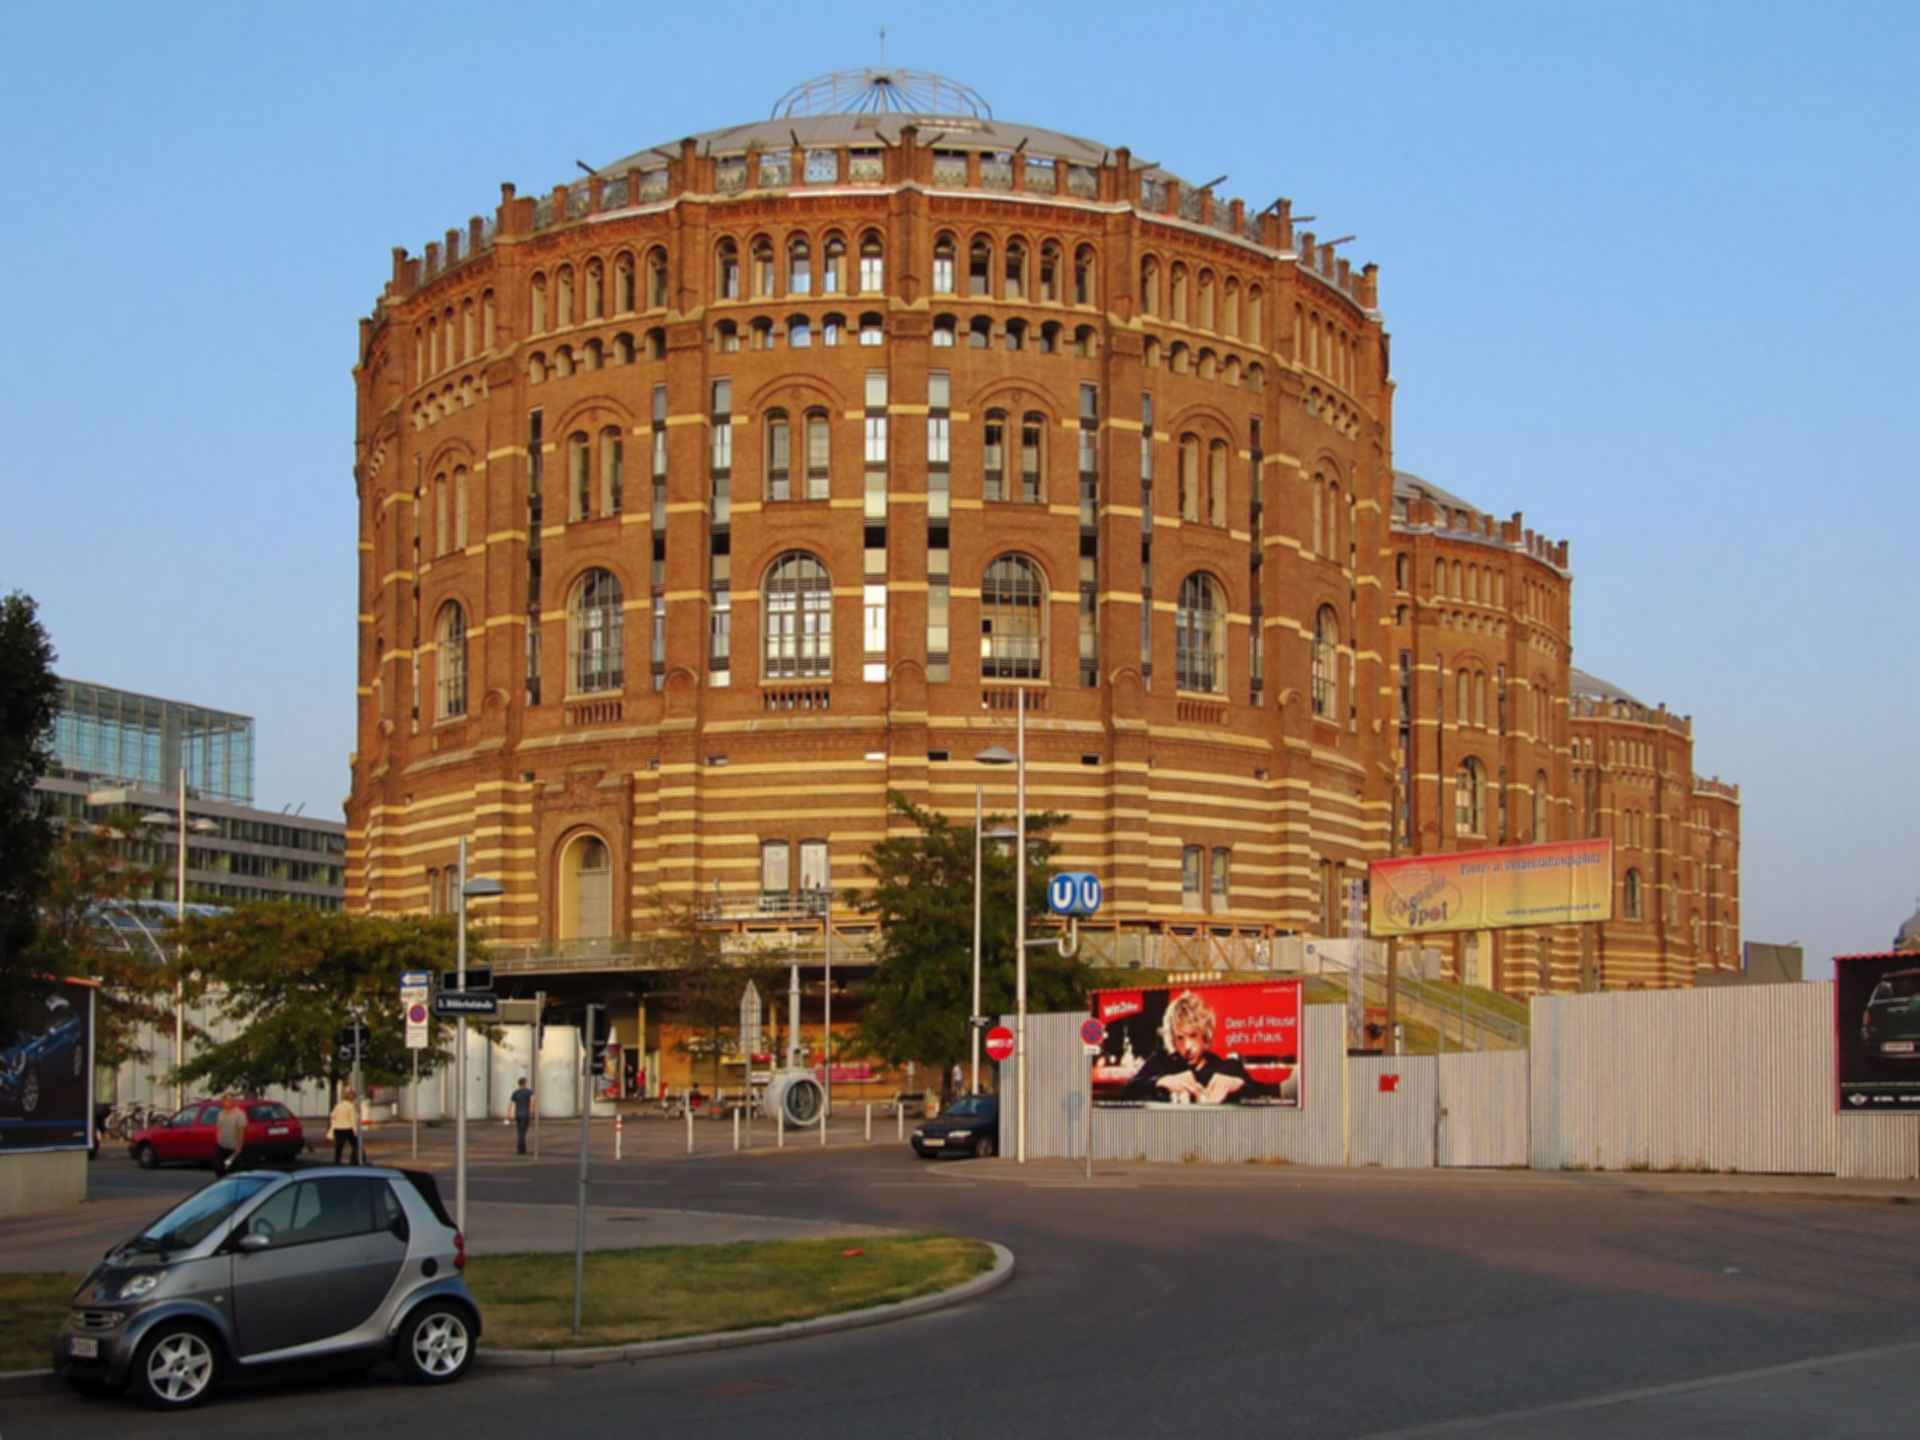 Gasometers of Vienna - Exterior